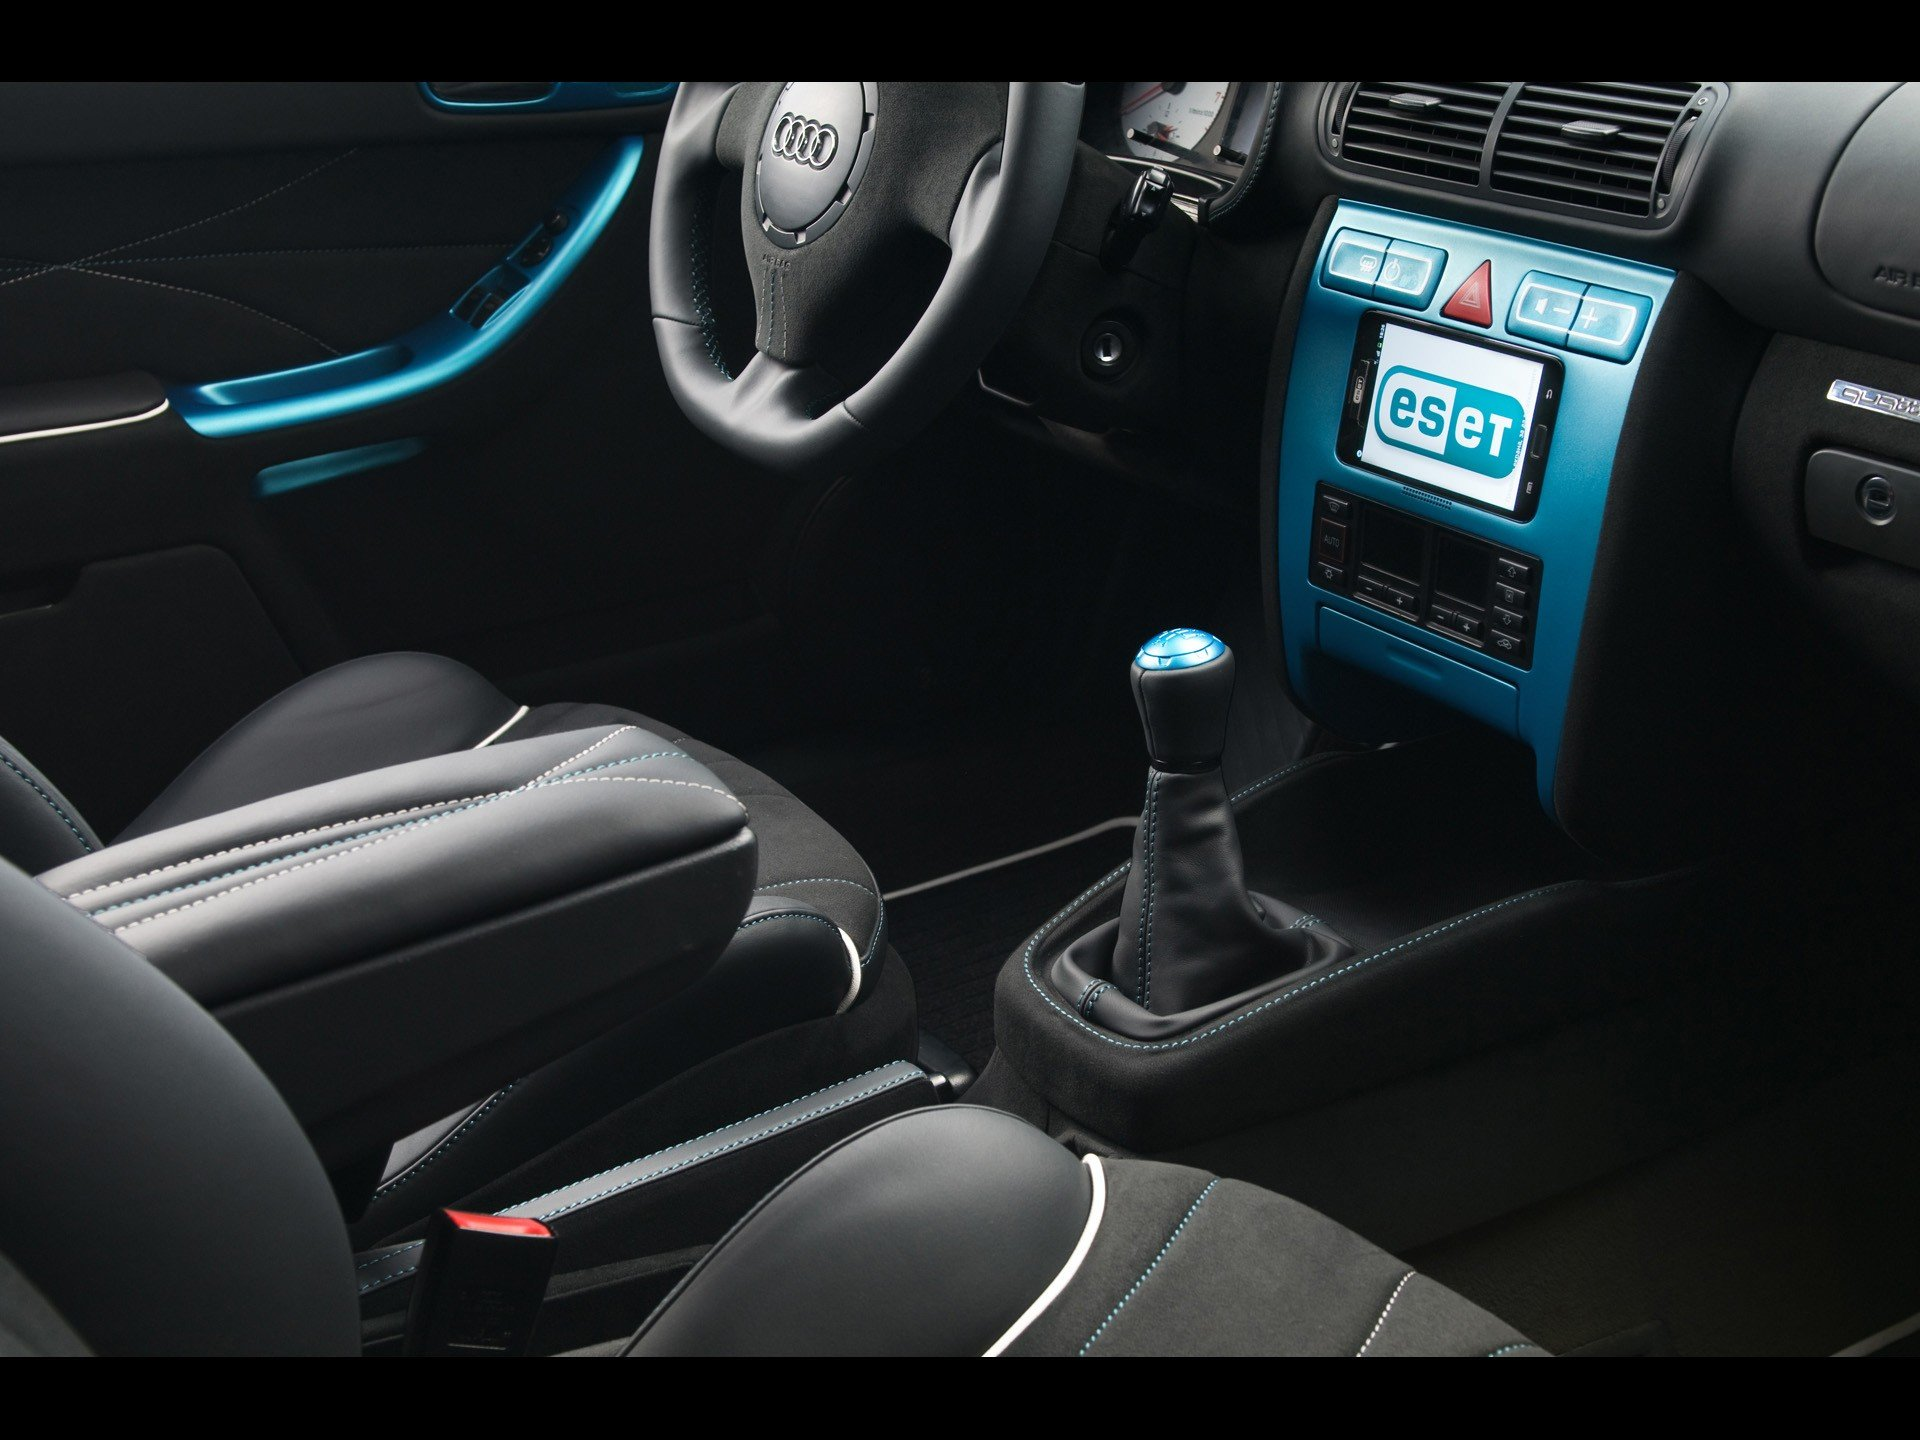 cars console interior tuning audi a3 eset wallpaper 1920x1440 257845 wallpaperup. Black Bedroom Furniture Sets. Home Design Ideas